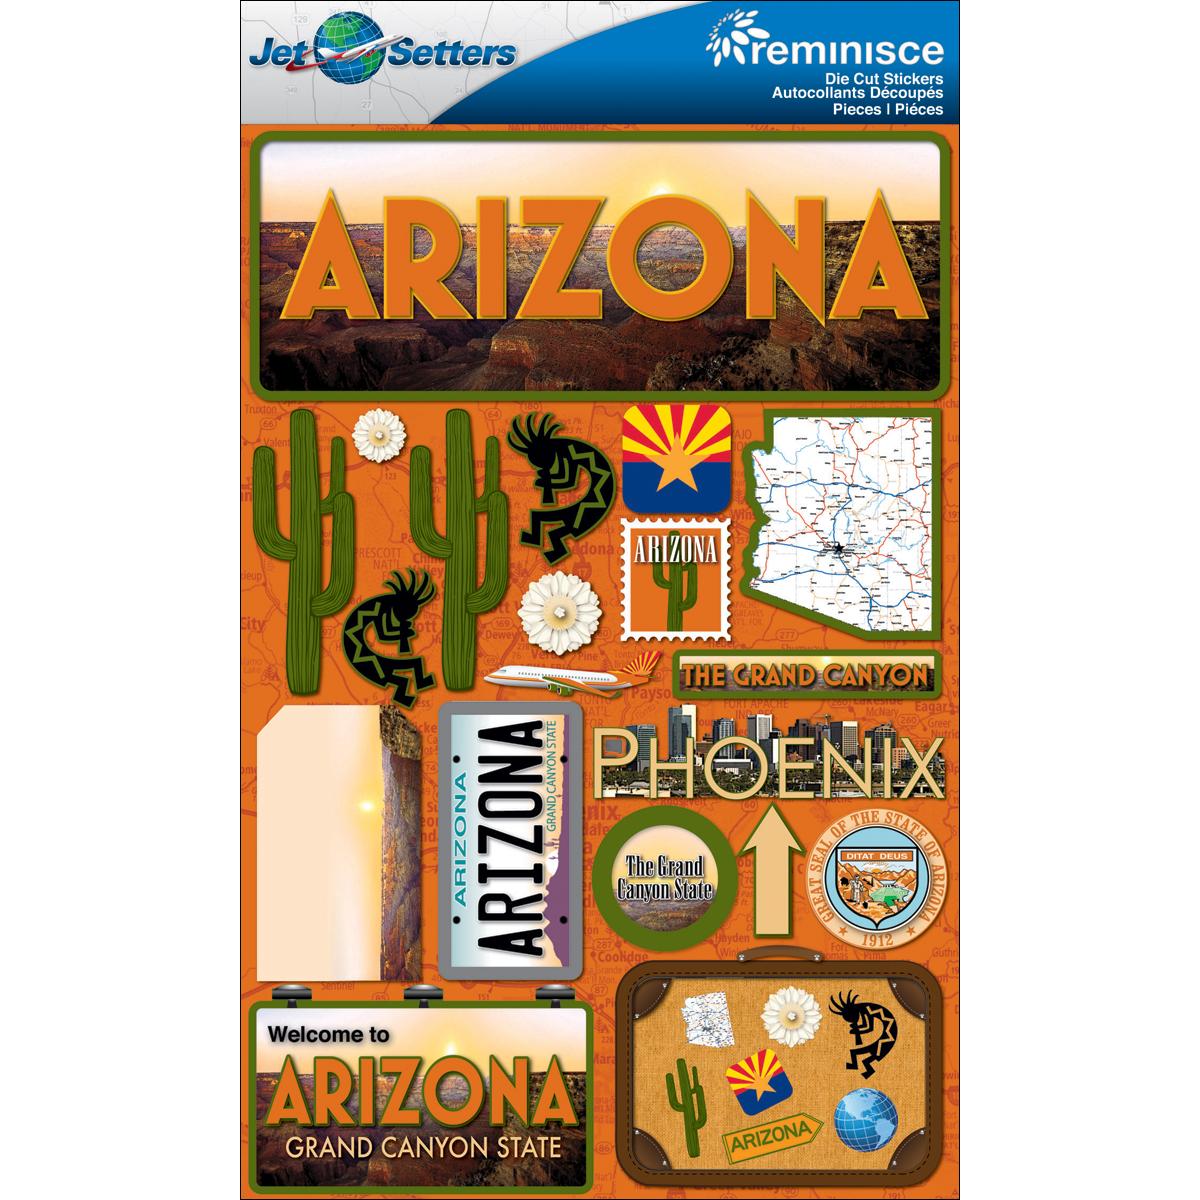 Arizona - Reminisce Jet Setters State Dimensional Stickers